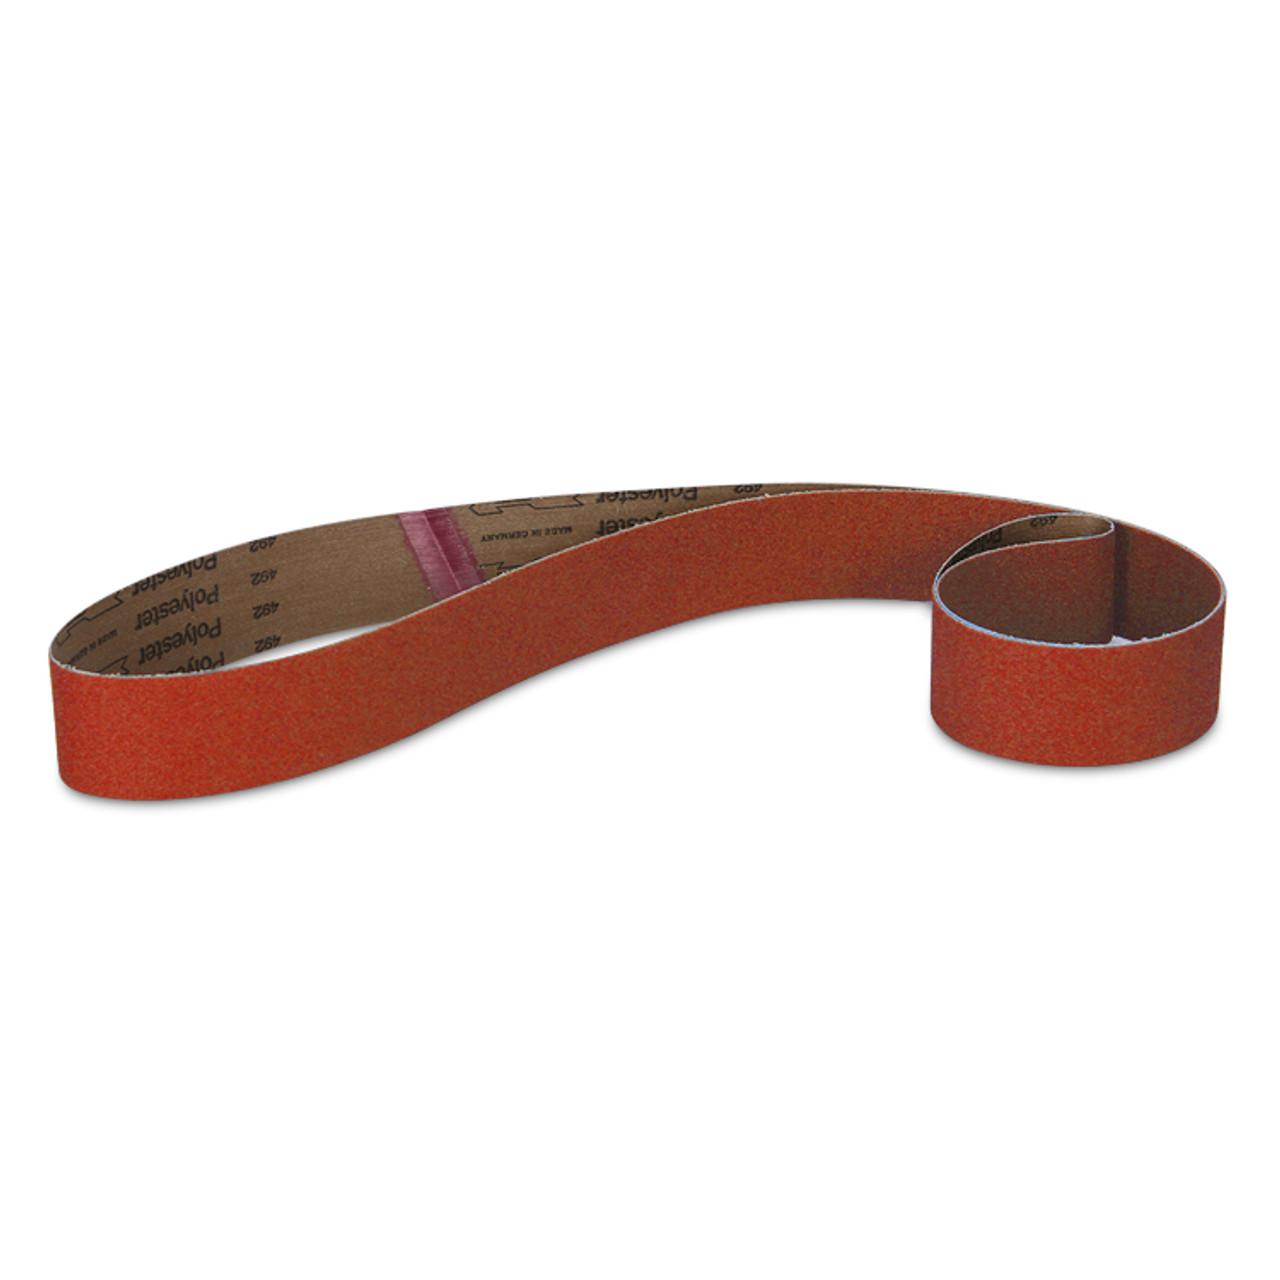 2 X 42 Ceramic Sanding Belt